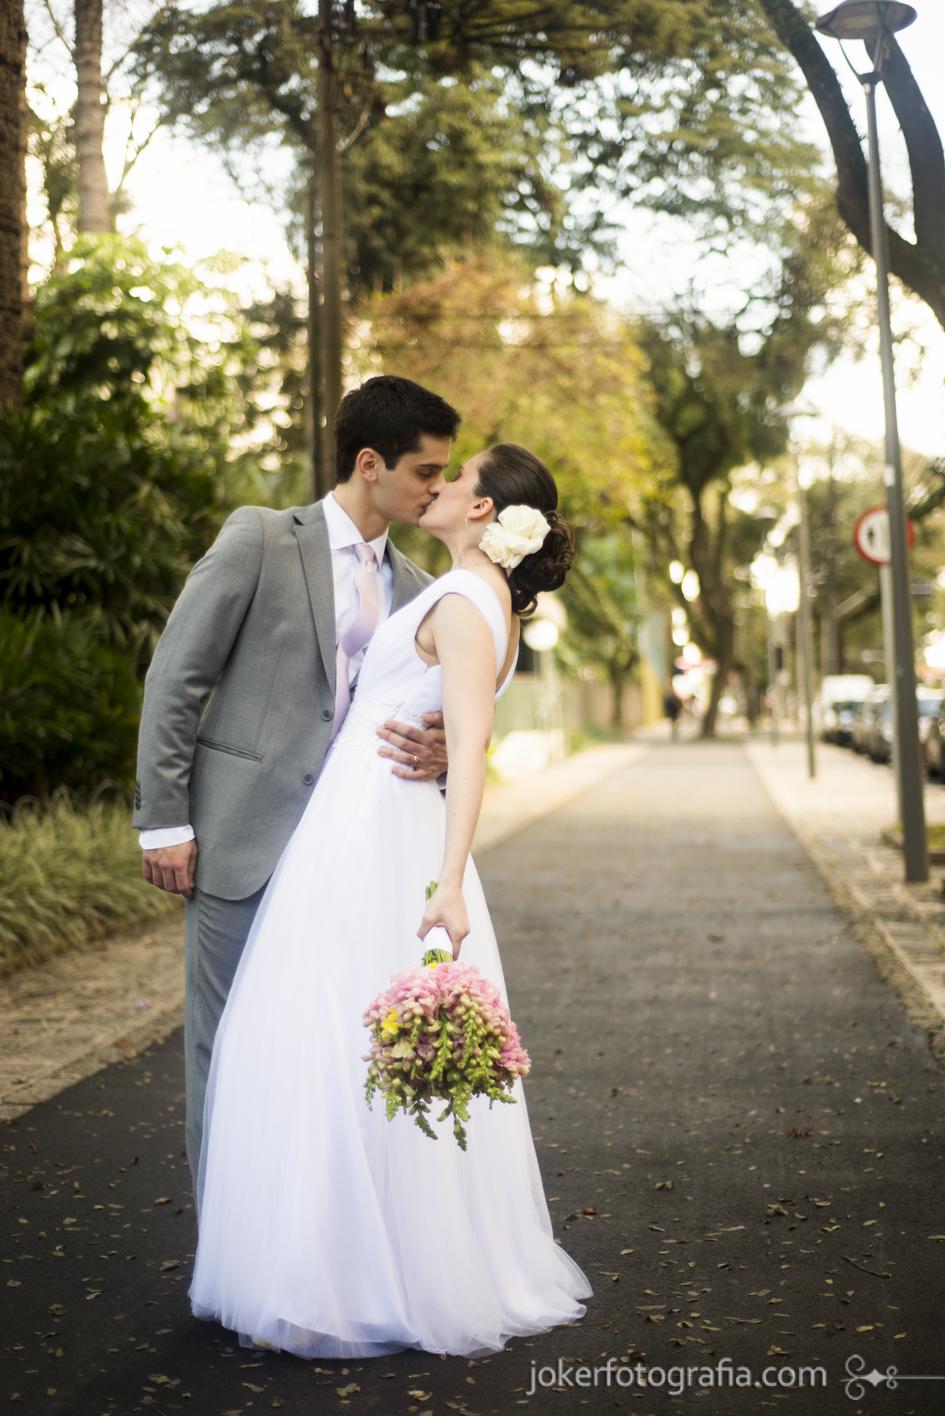 maria isabel e daniel casamento bel e dani